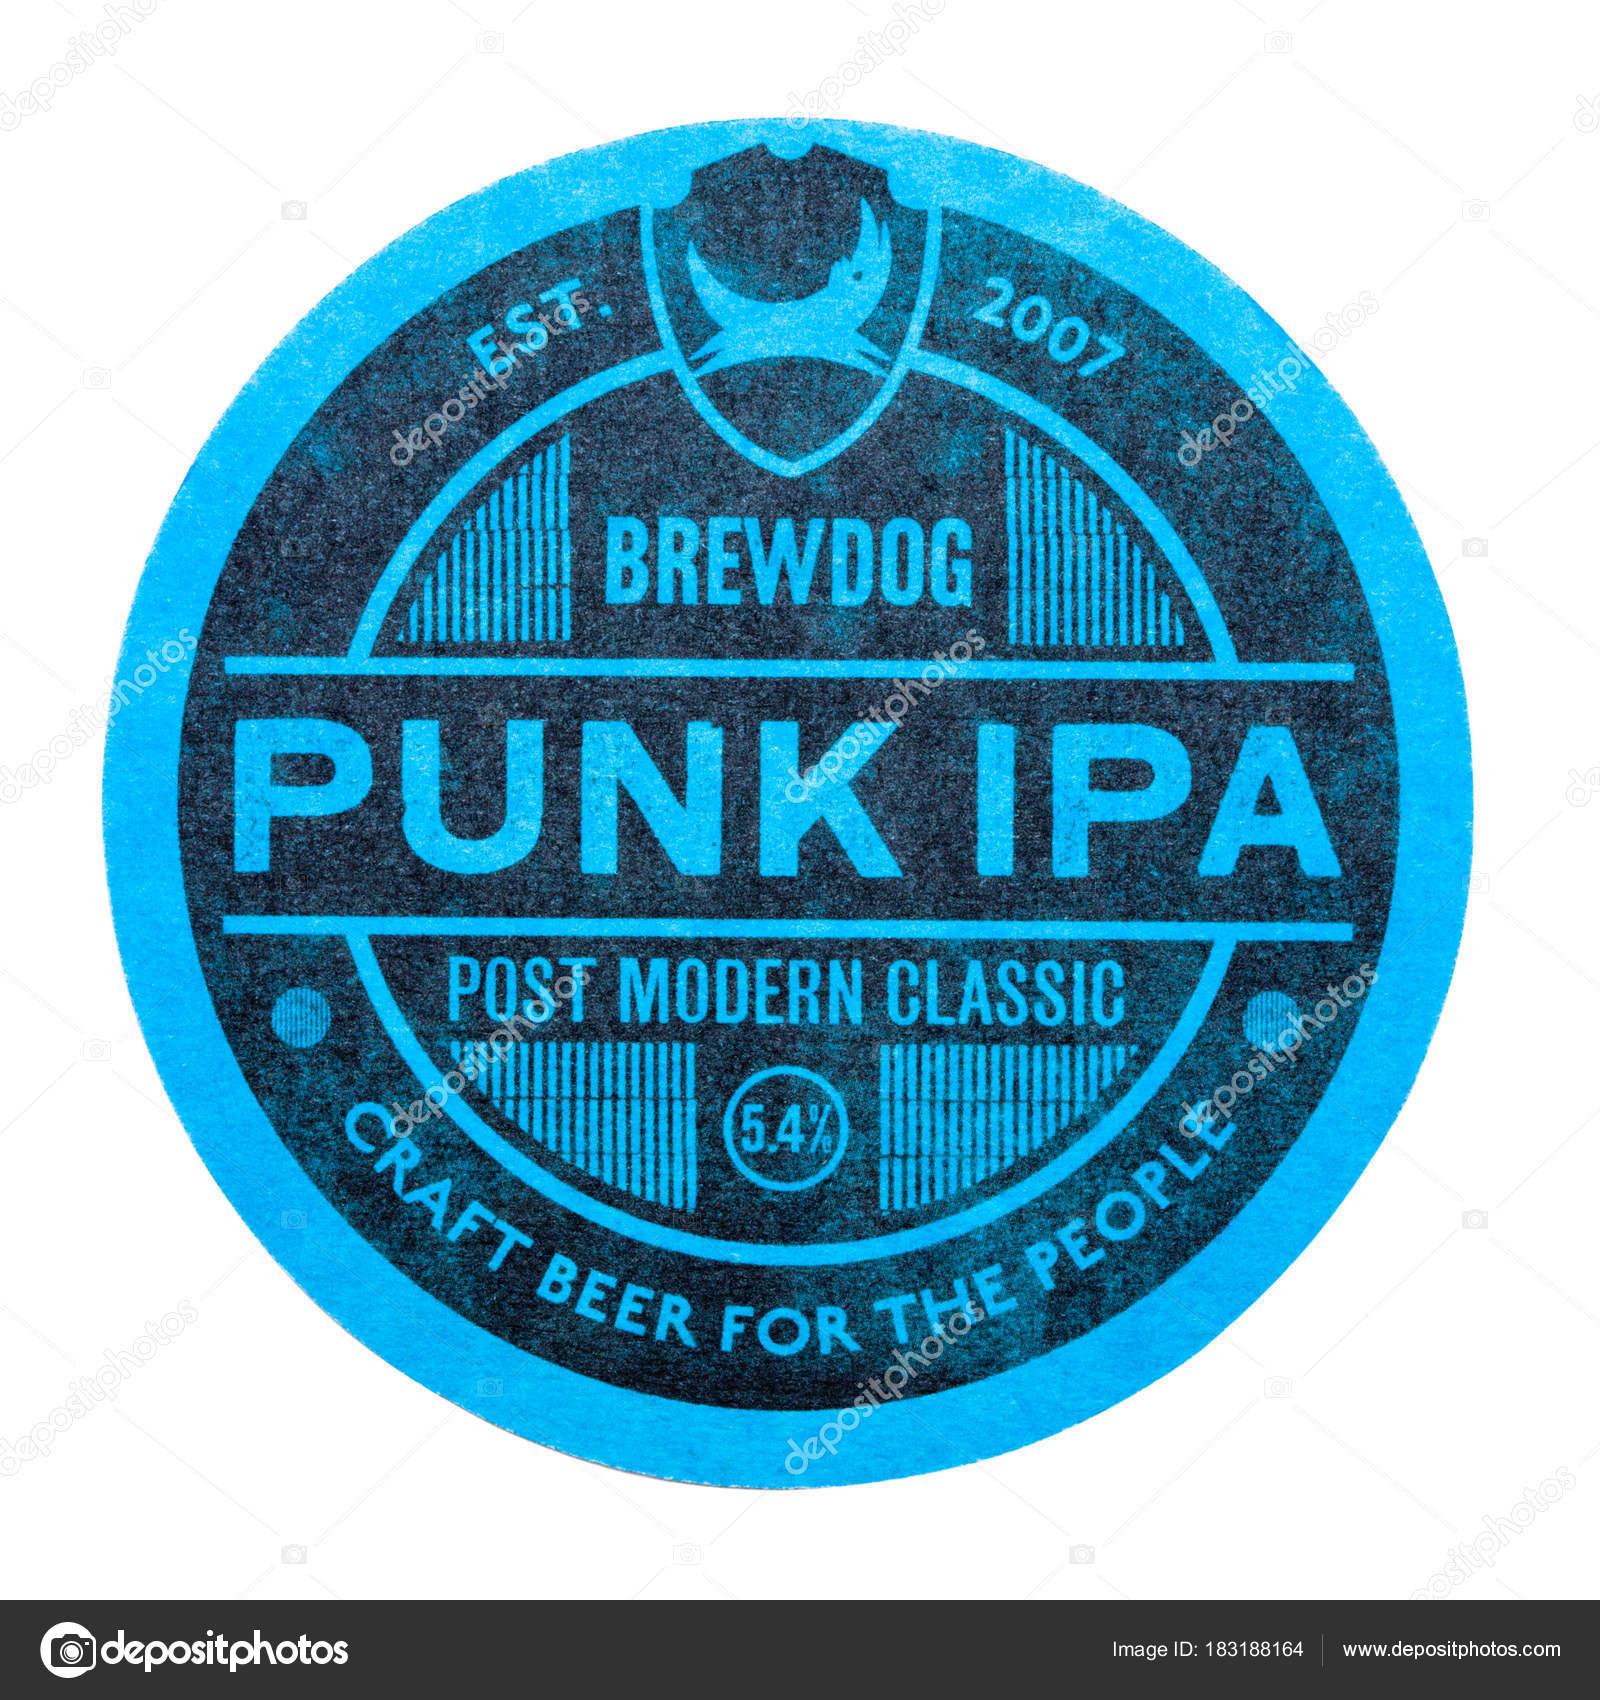 London Uk February 04 2018 Brewdog Punk Ipa Craft Beer Original Beermat Coaster Isolated On White Stock Editorial Photo C Denismart 183188164